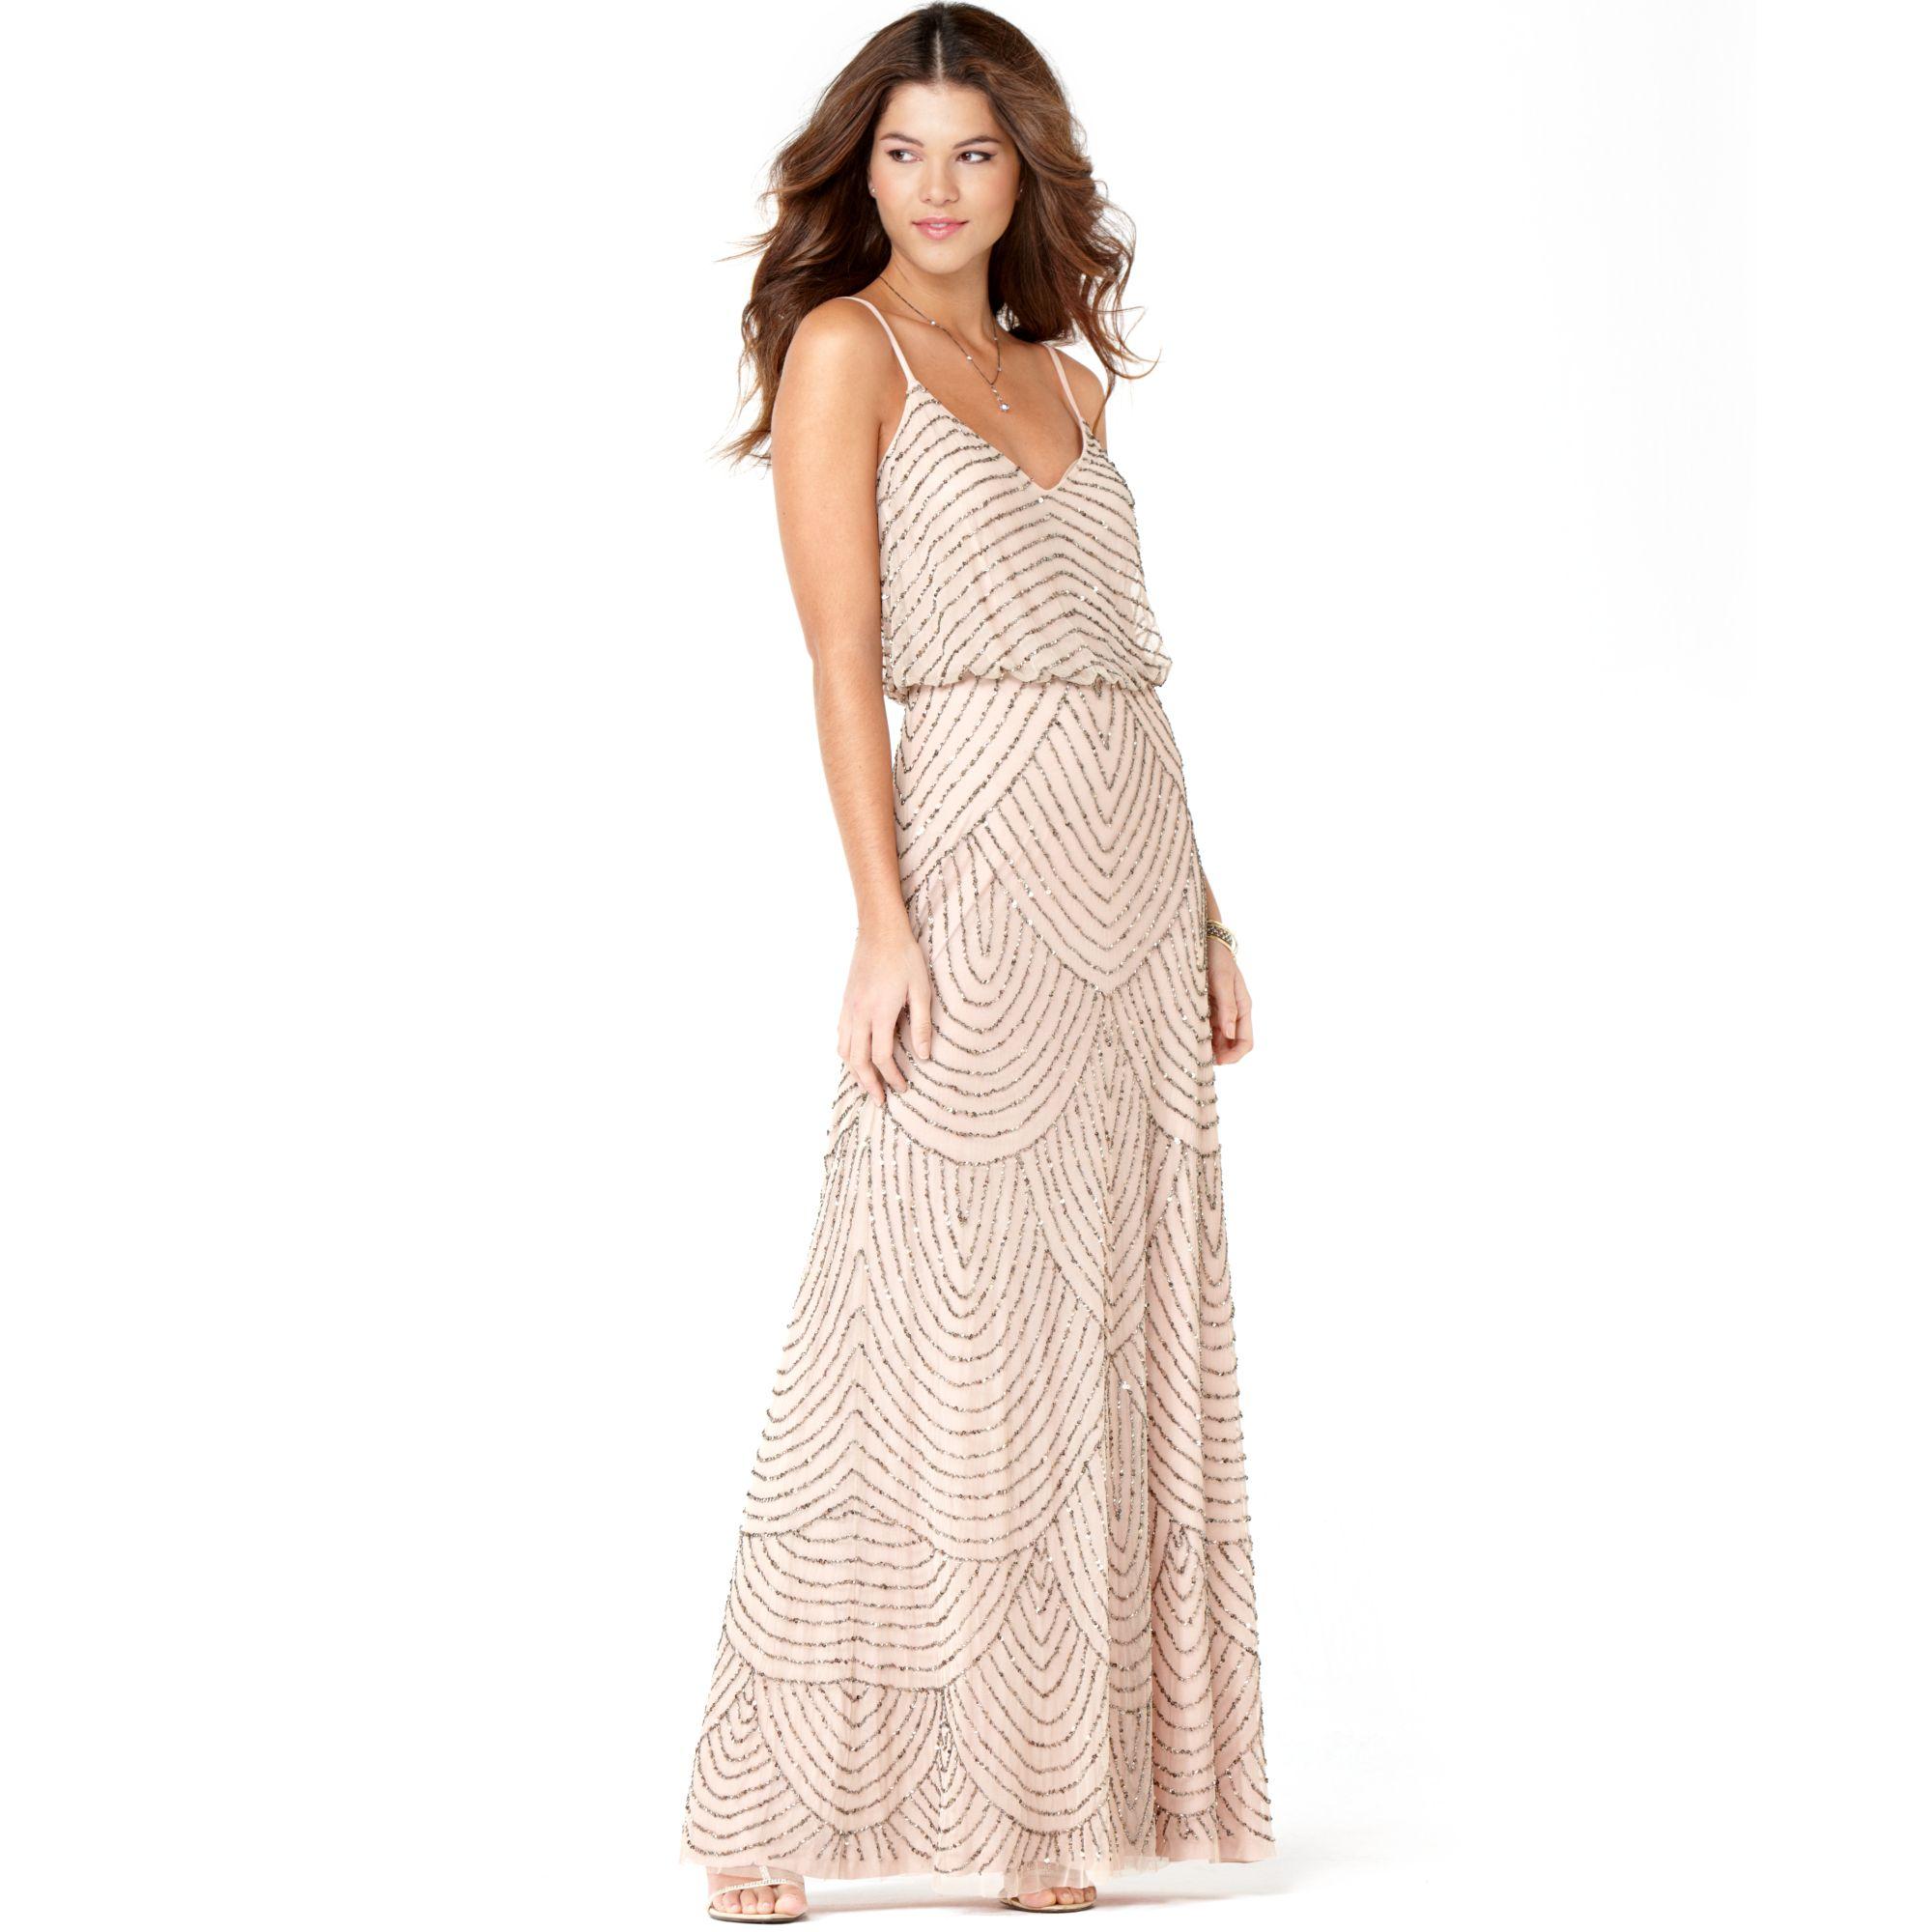 macys maternity dresses photo - 1